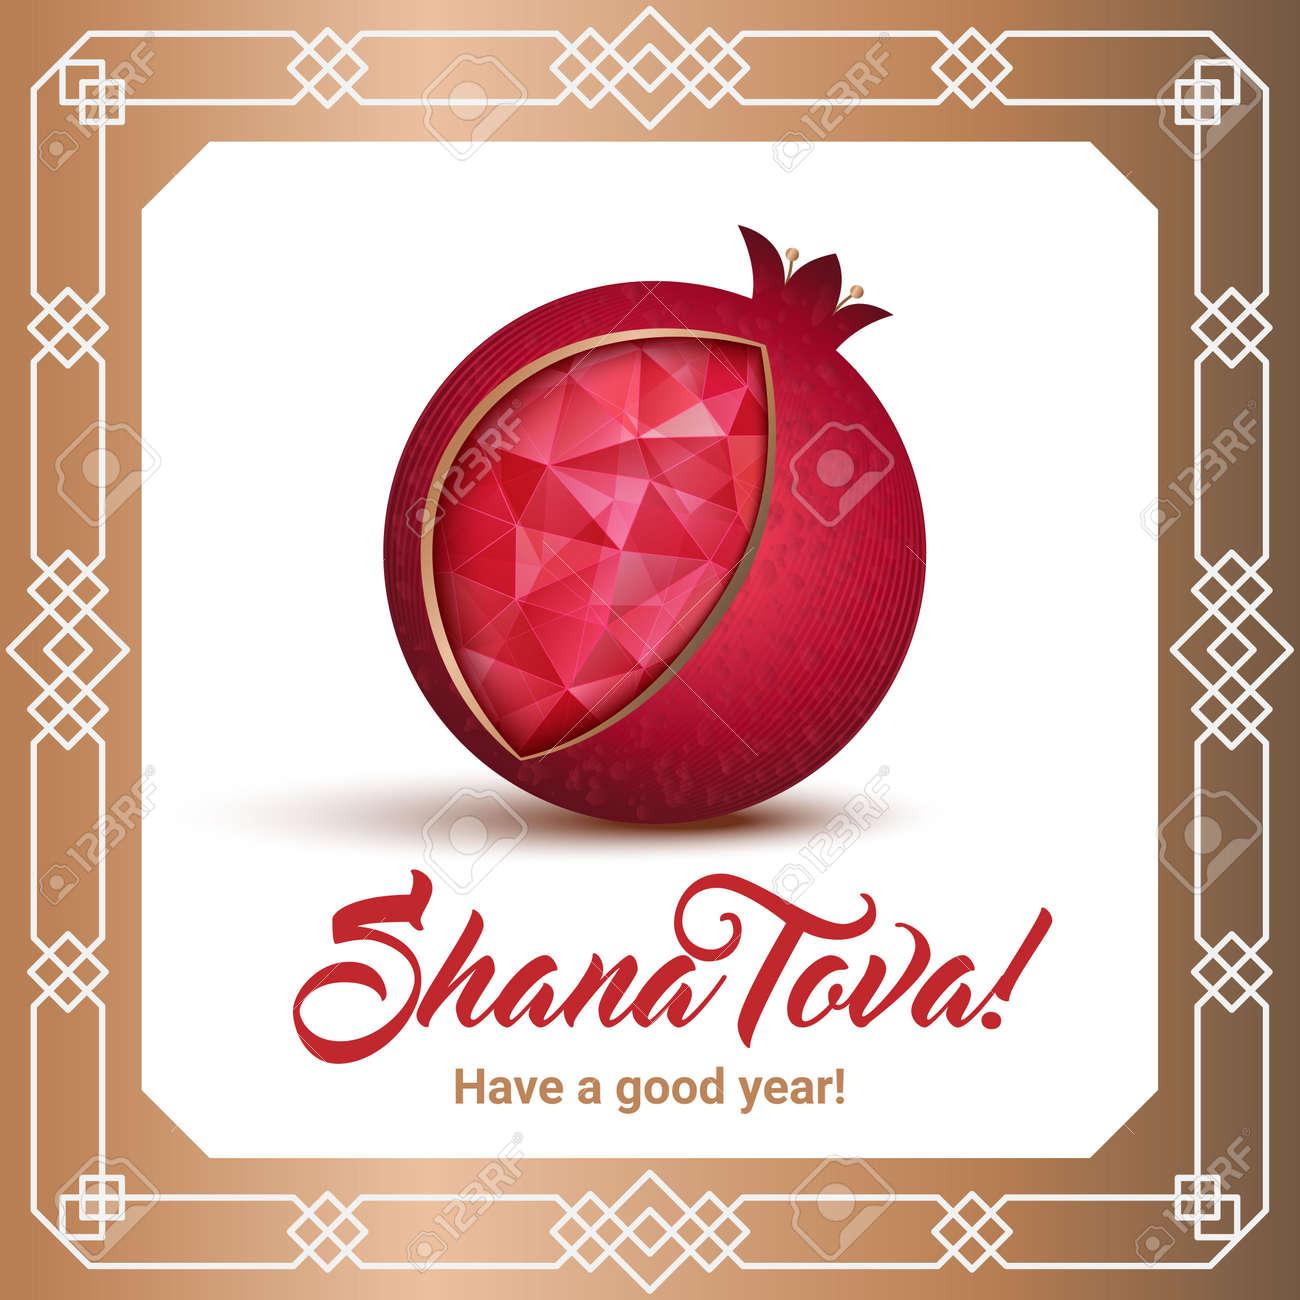 Rosh Hashana Card Jewish New Year Greeting Text Shana Tova On